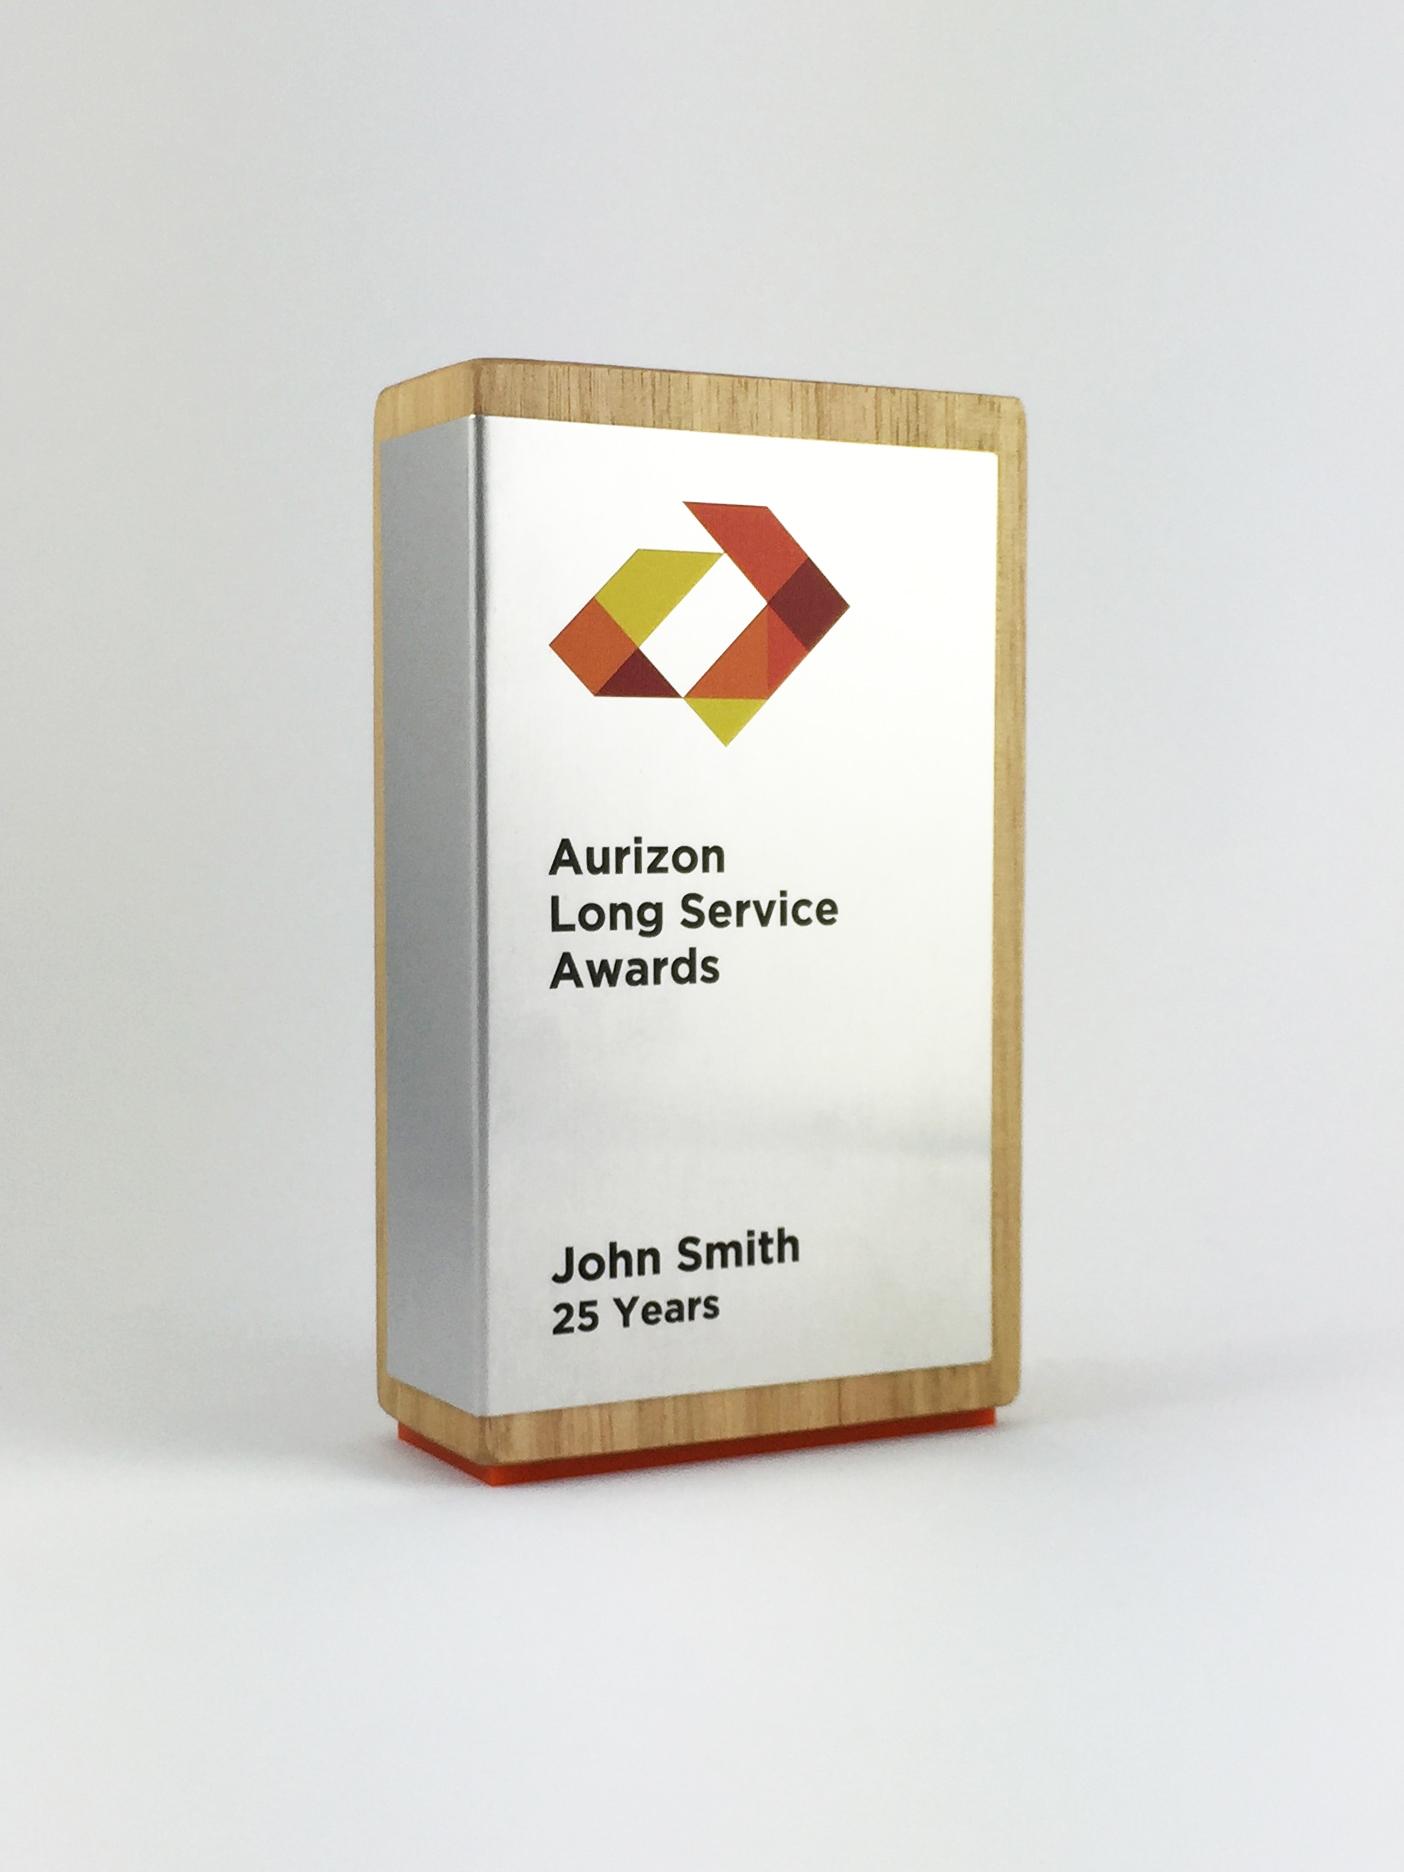 aurizon-recognition-awards-timber-cube-metal-trophy-03.jpg